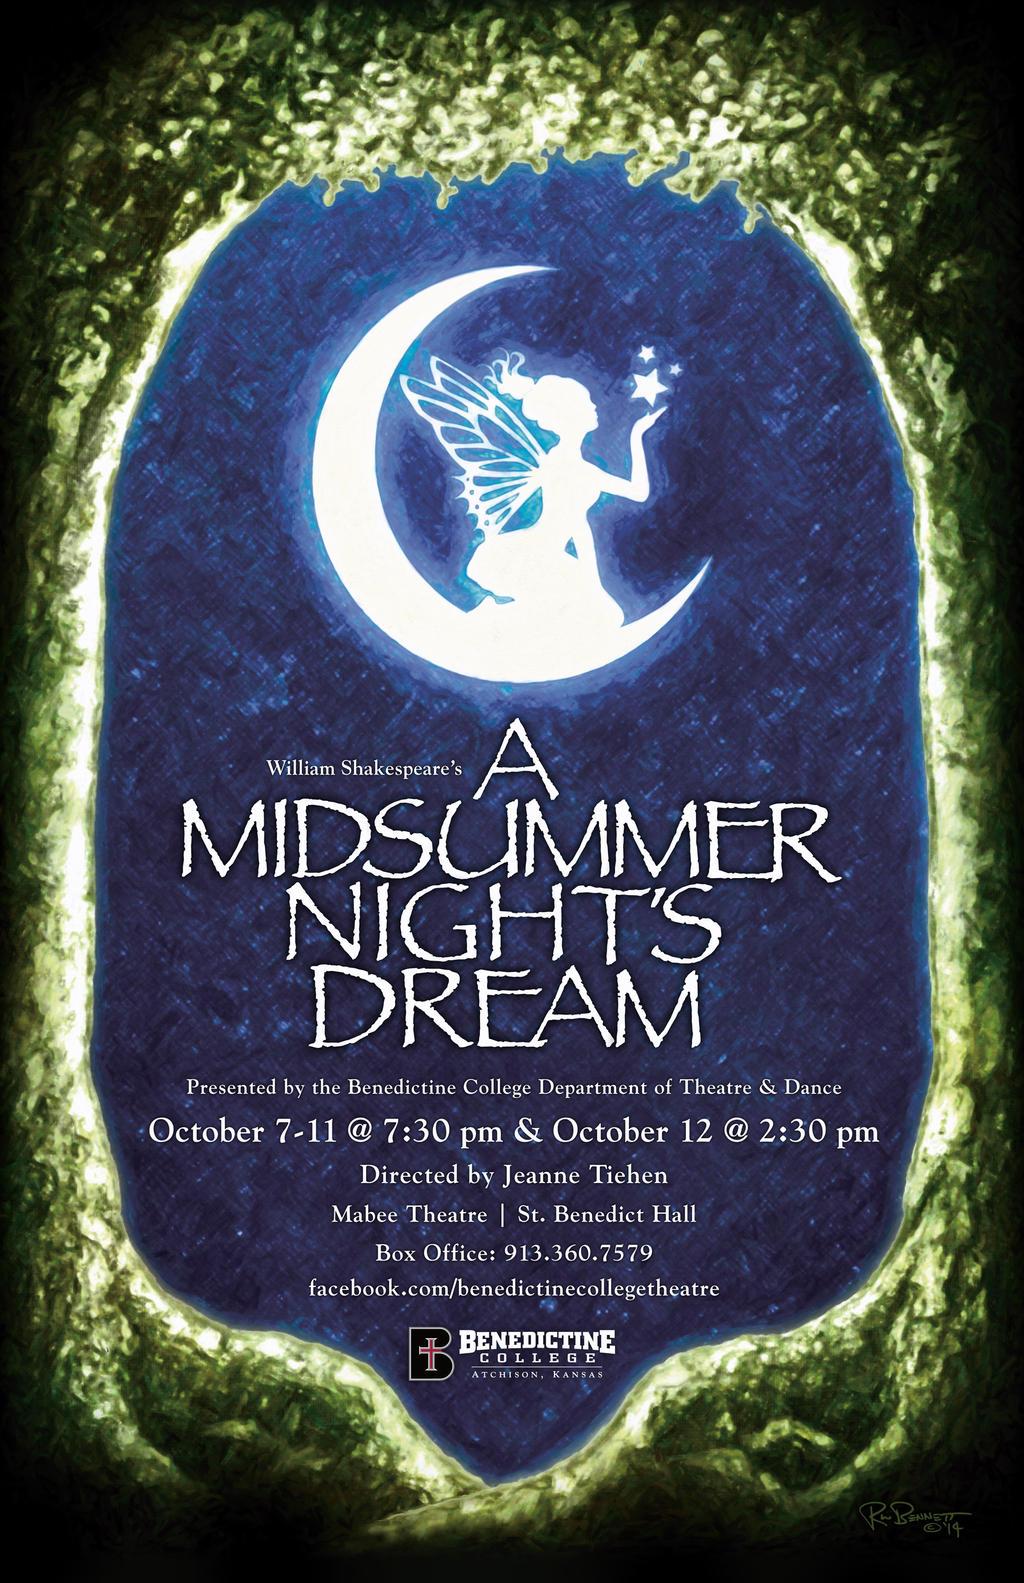 A Midsummer Night's Dream Poster by BigGuido on DeviantArt